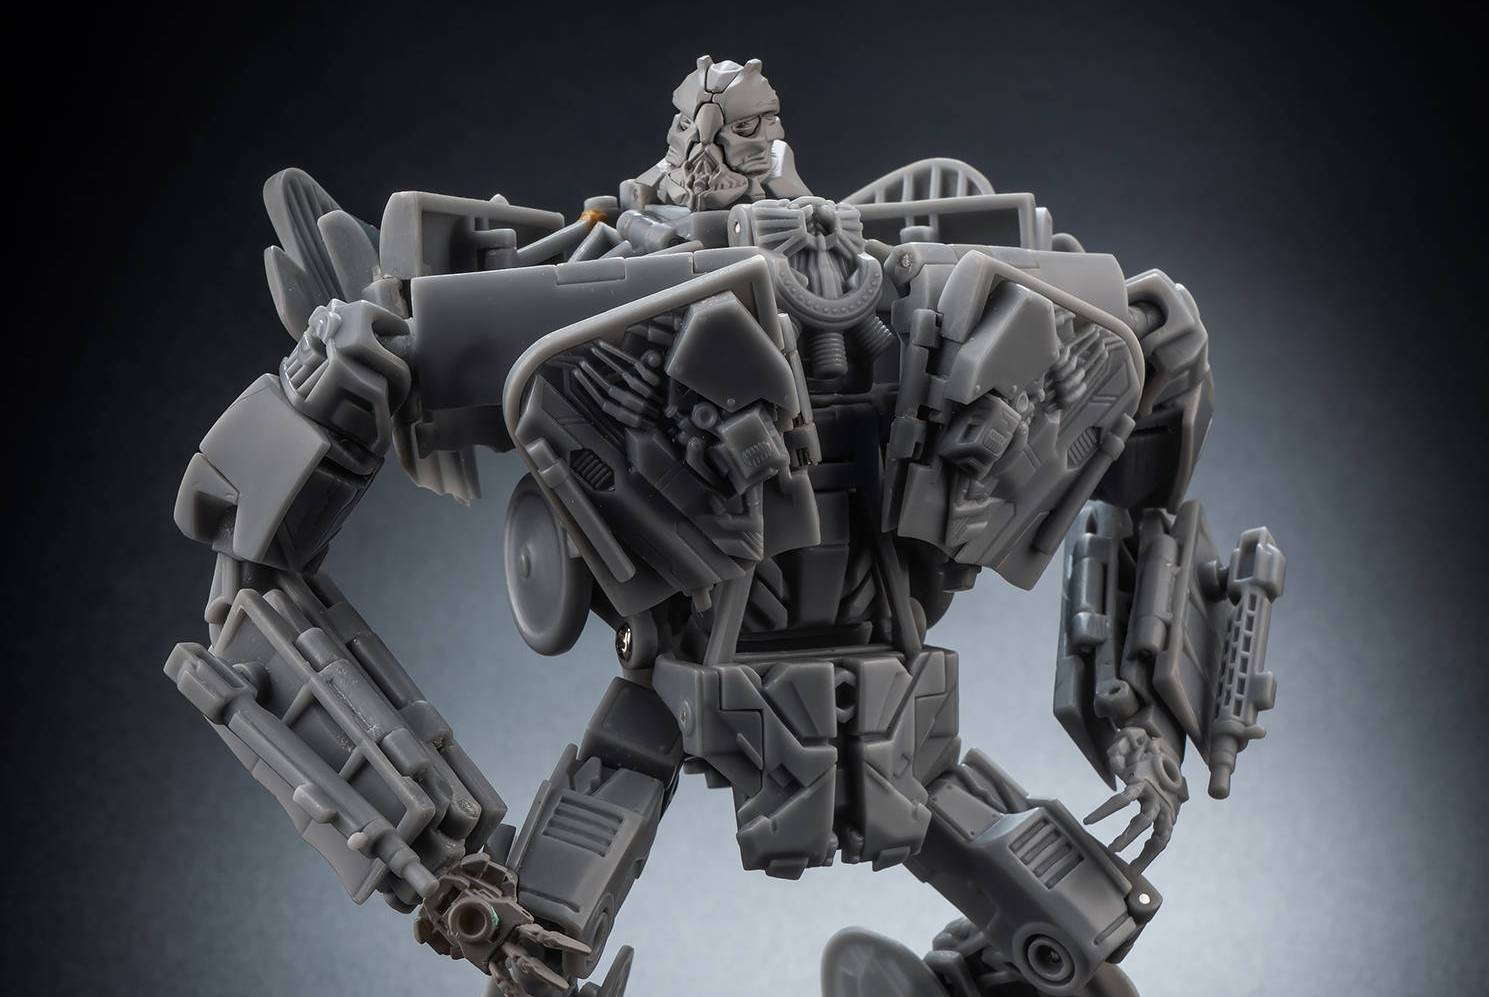 TW公布一战红蜘蛛的载具试模图,这是要转做军事模型了?